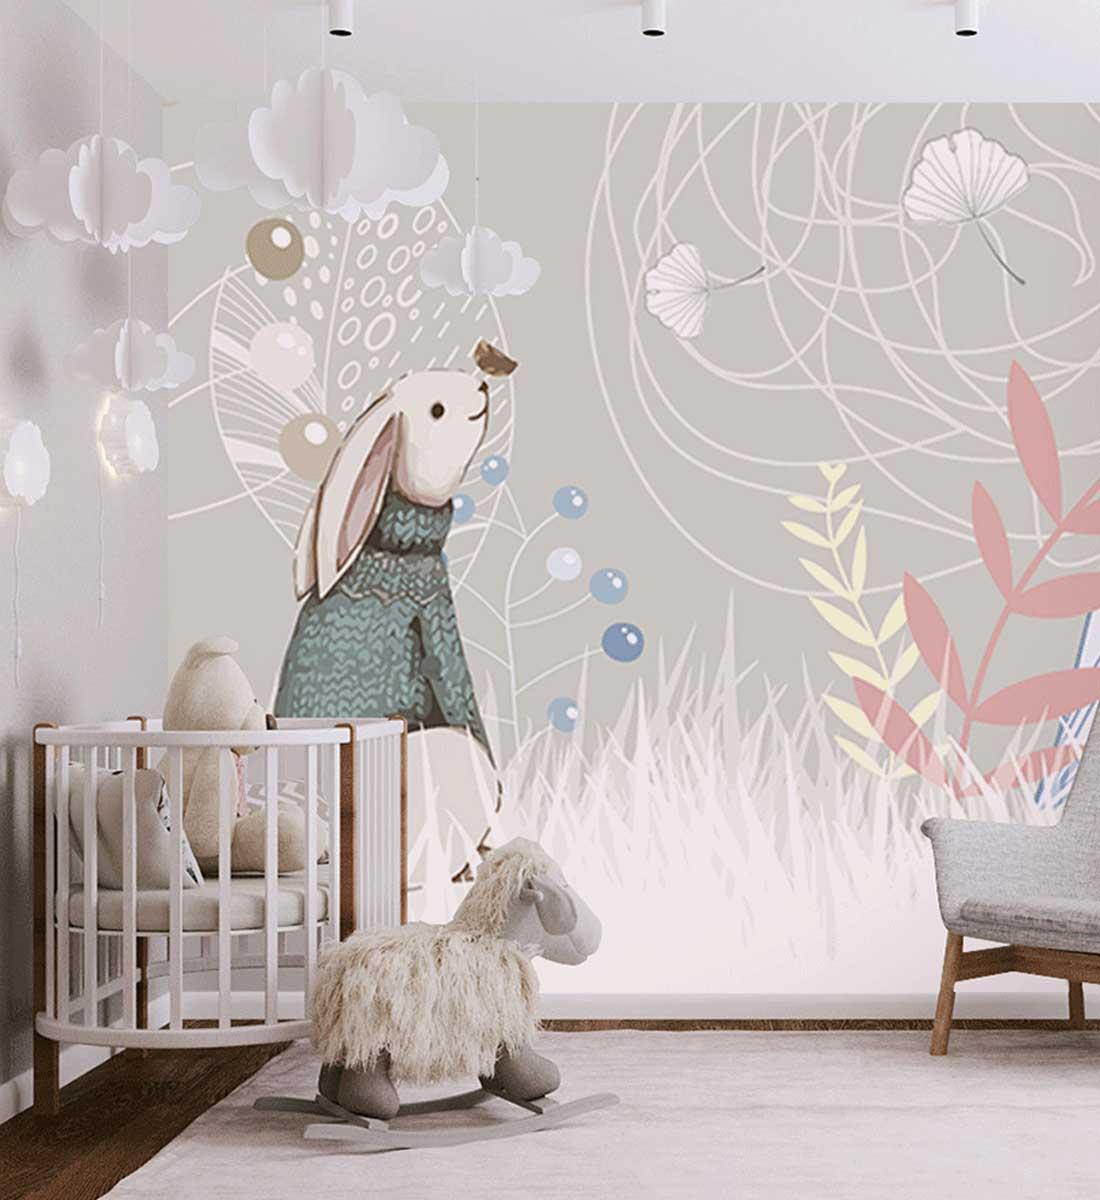 JCC天洋儿童房兔子童话墙布